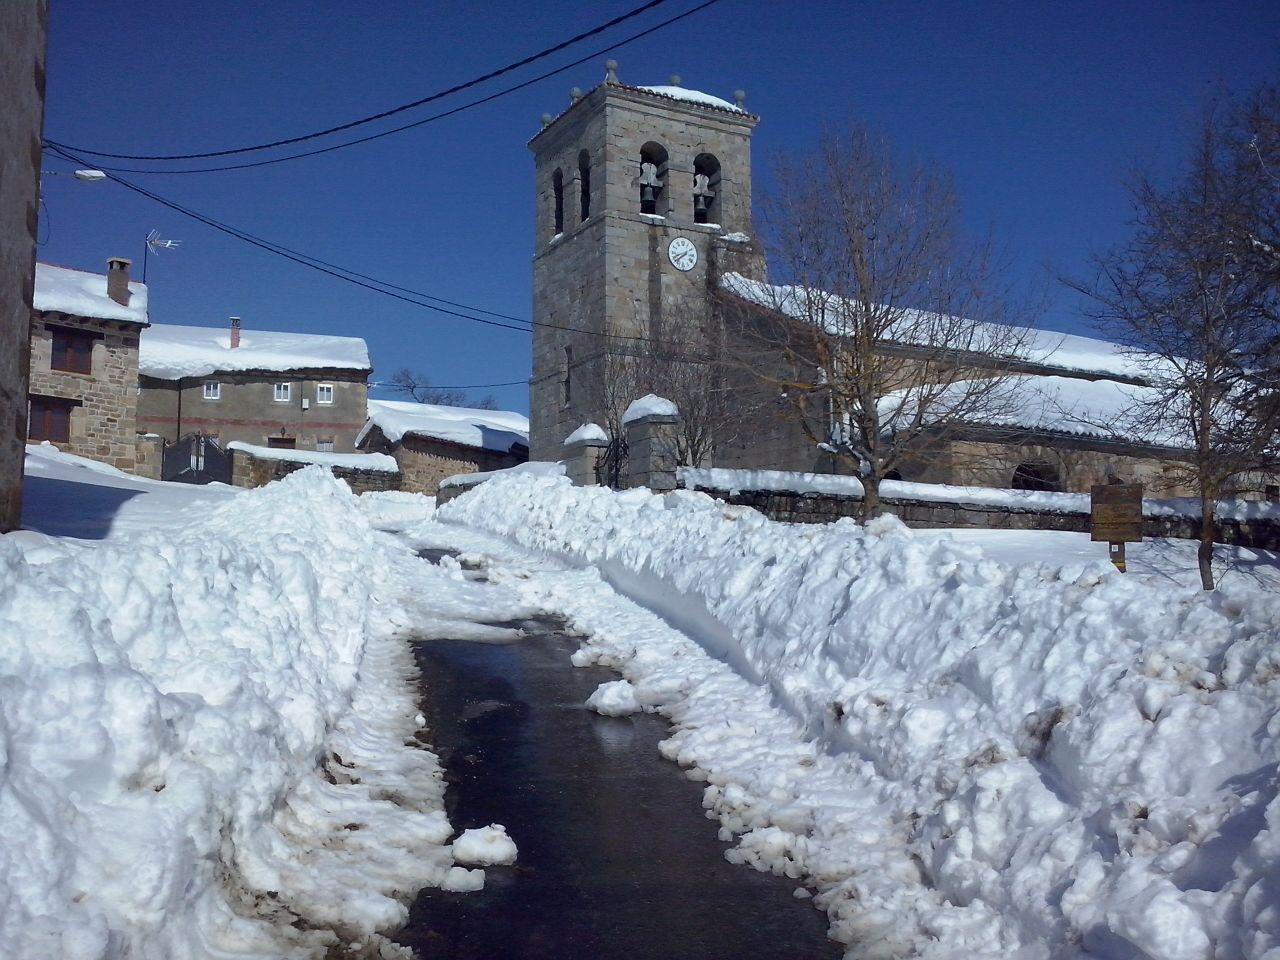 https://www.navamuel.es/images/Nevada2015v2/Iglesia.jpg